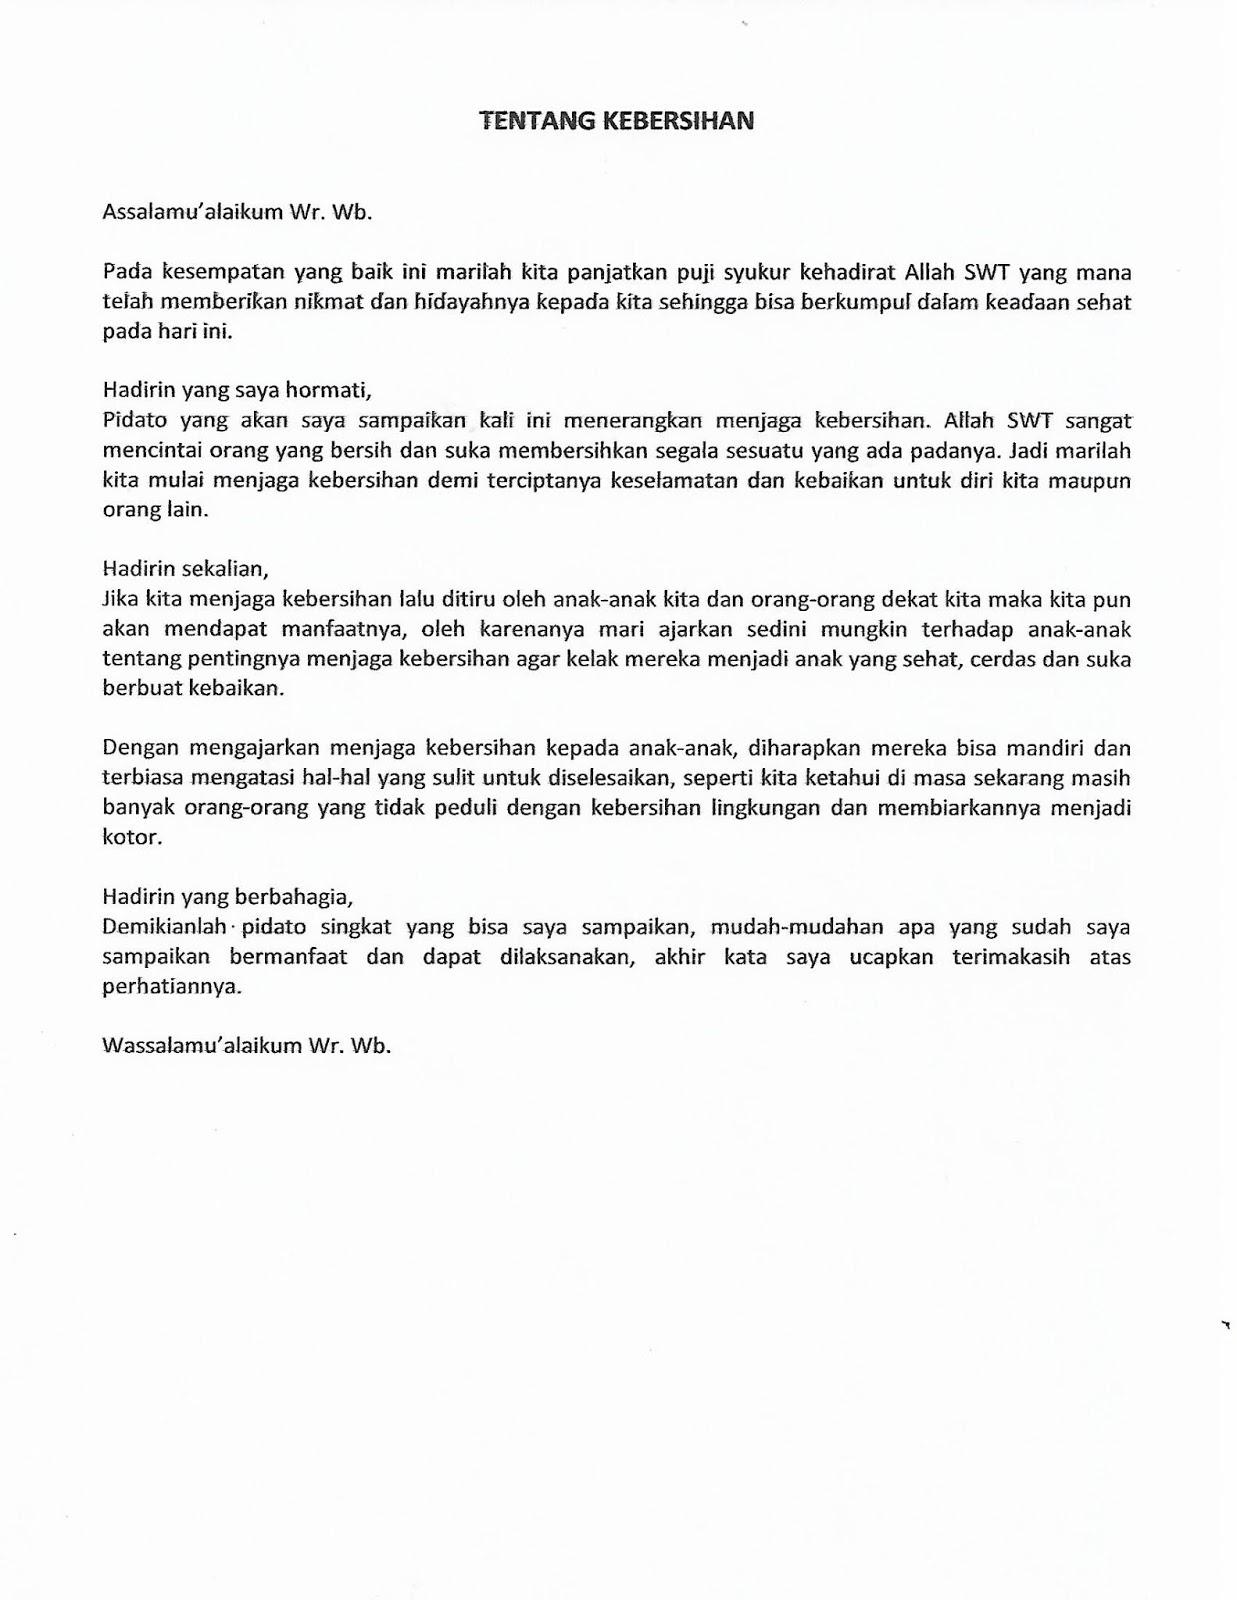 Contoh Teks Pidato Singkat Untuk Tugas Sekolah Blog Kang